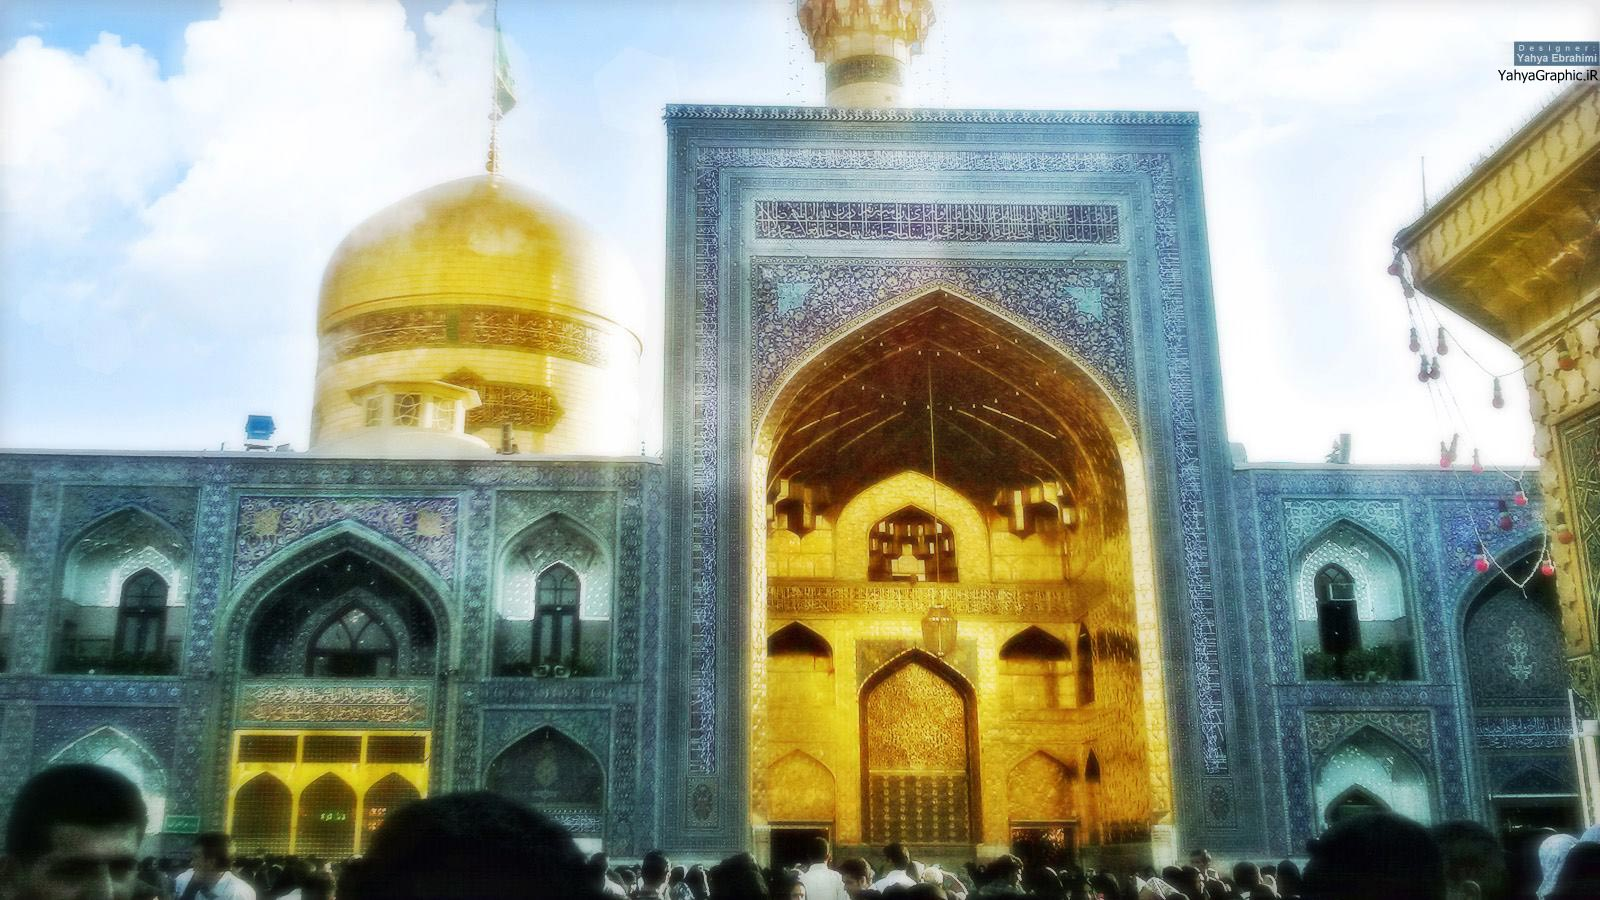 http://yahyagraphic.persiangig.com/image/tir_92/imam-reza.jpg